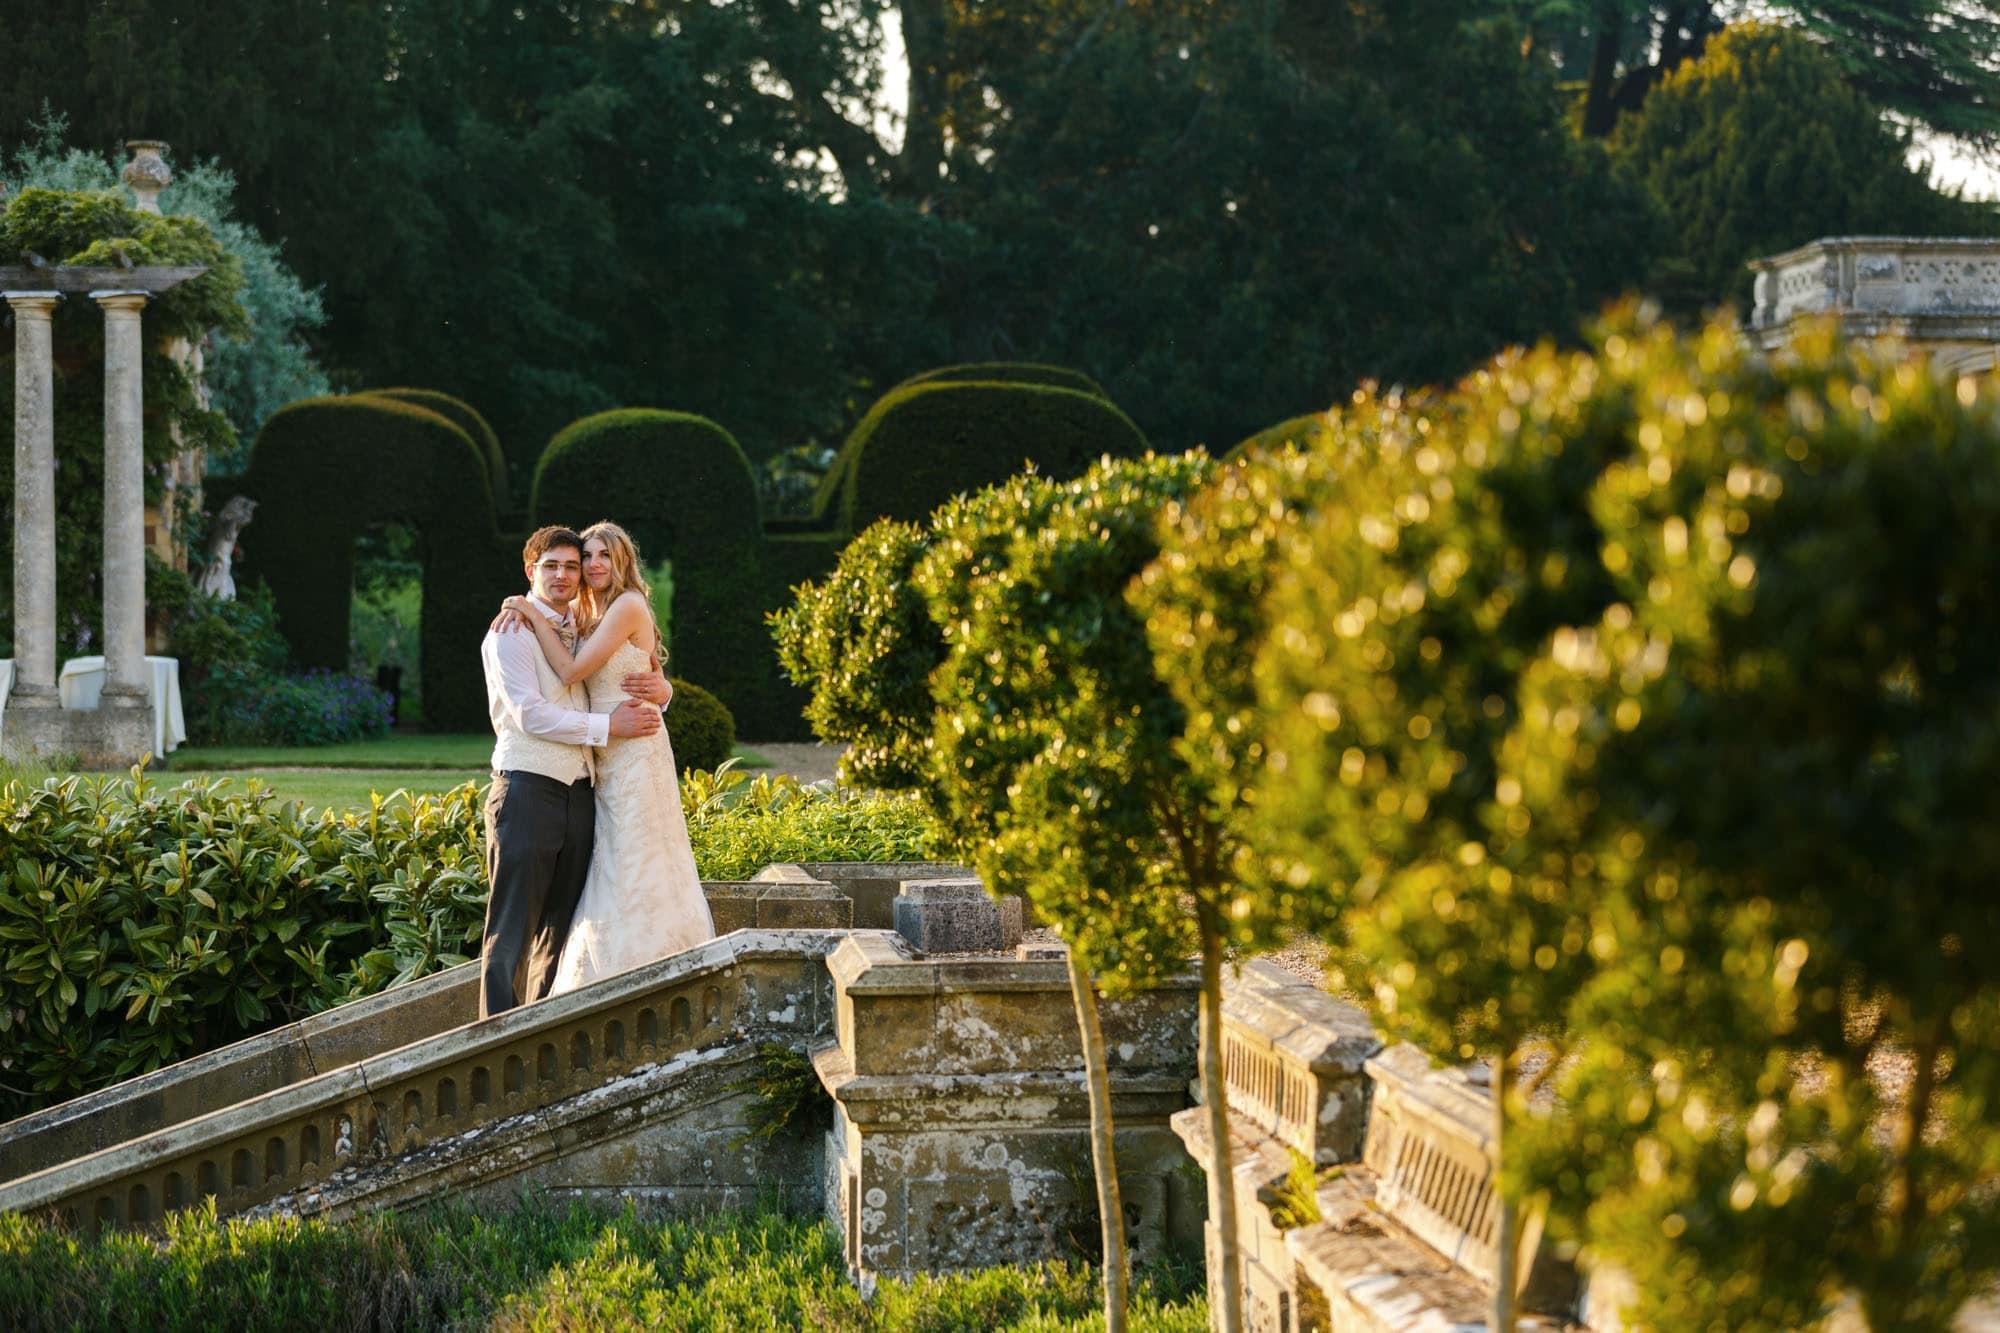 Somerleyton Hall wedding photographs